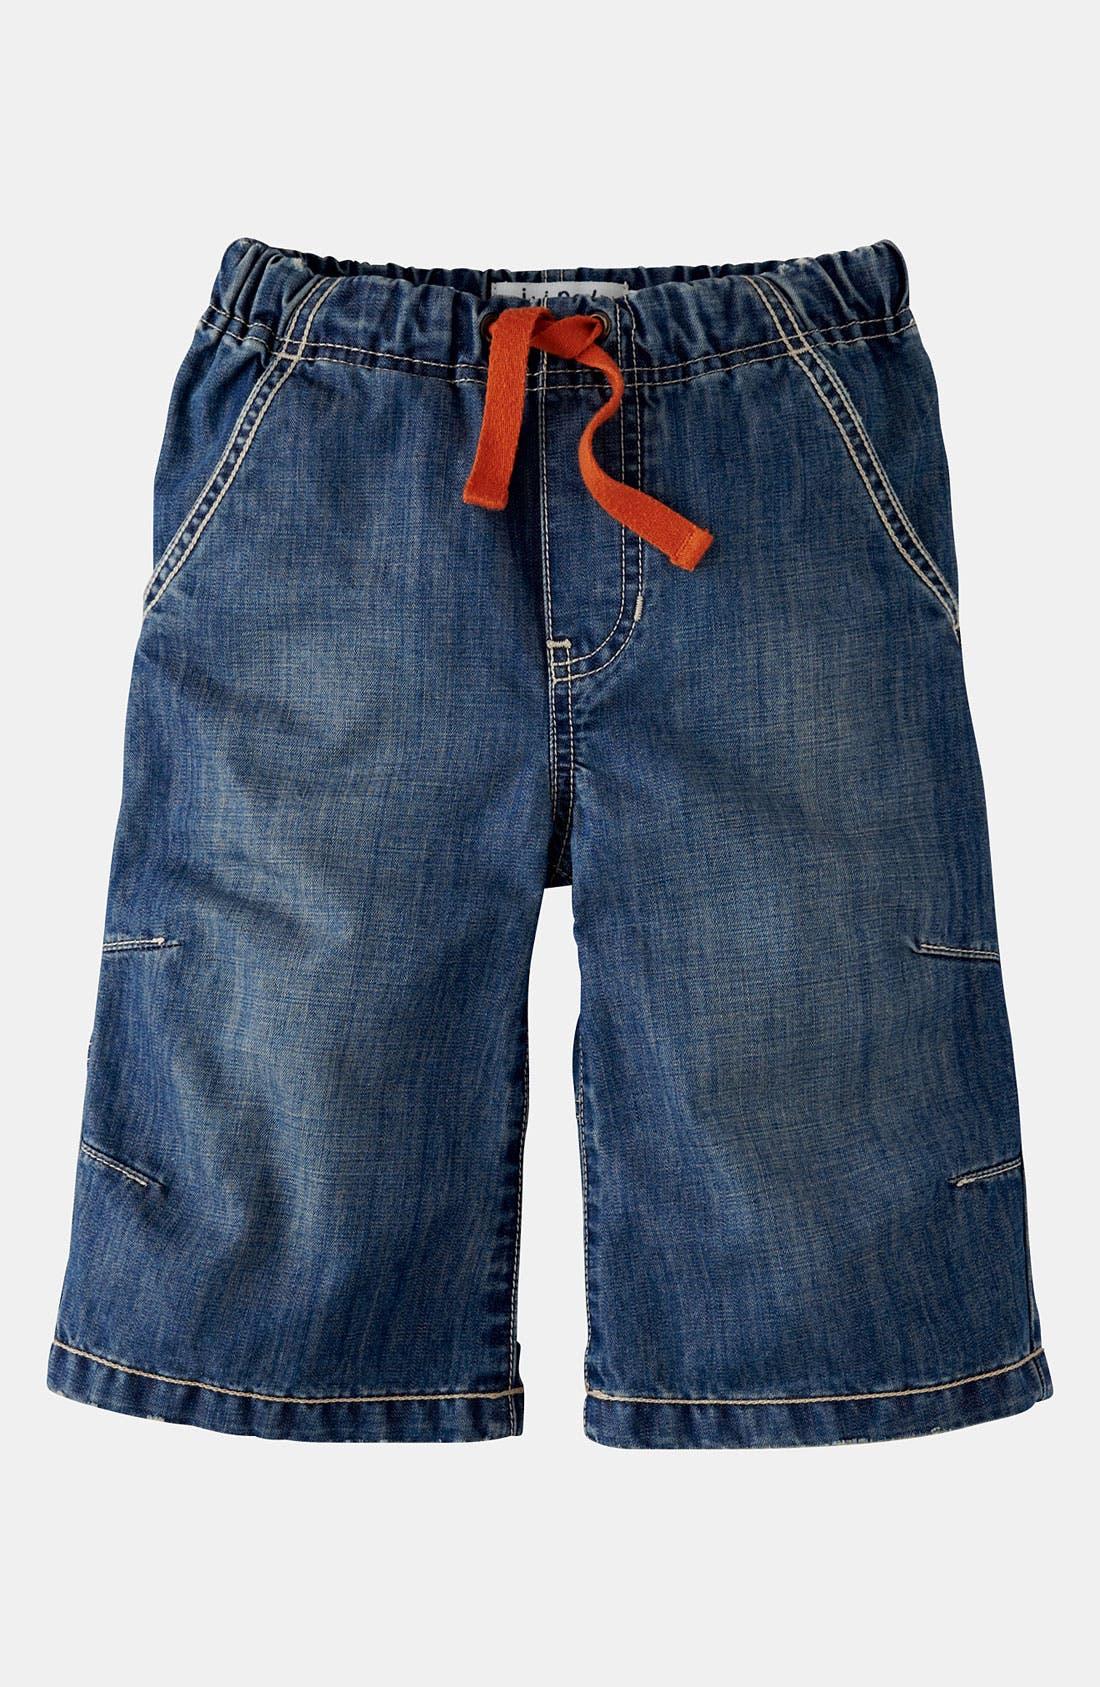 Alternate Image 1 Selected - Mini Boden Board Shorts (Little Boys & Big Boys)